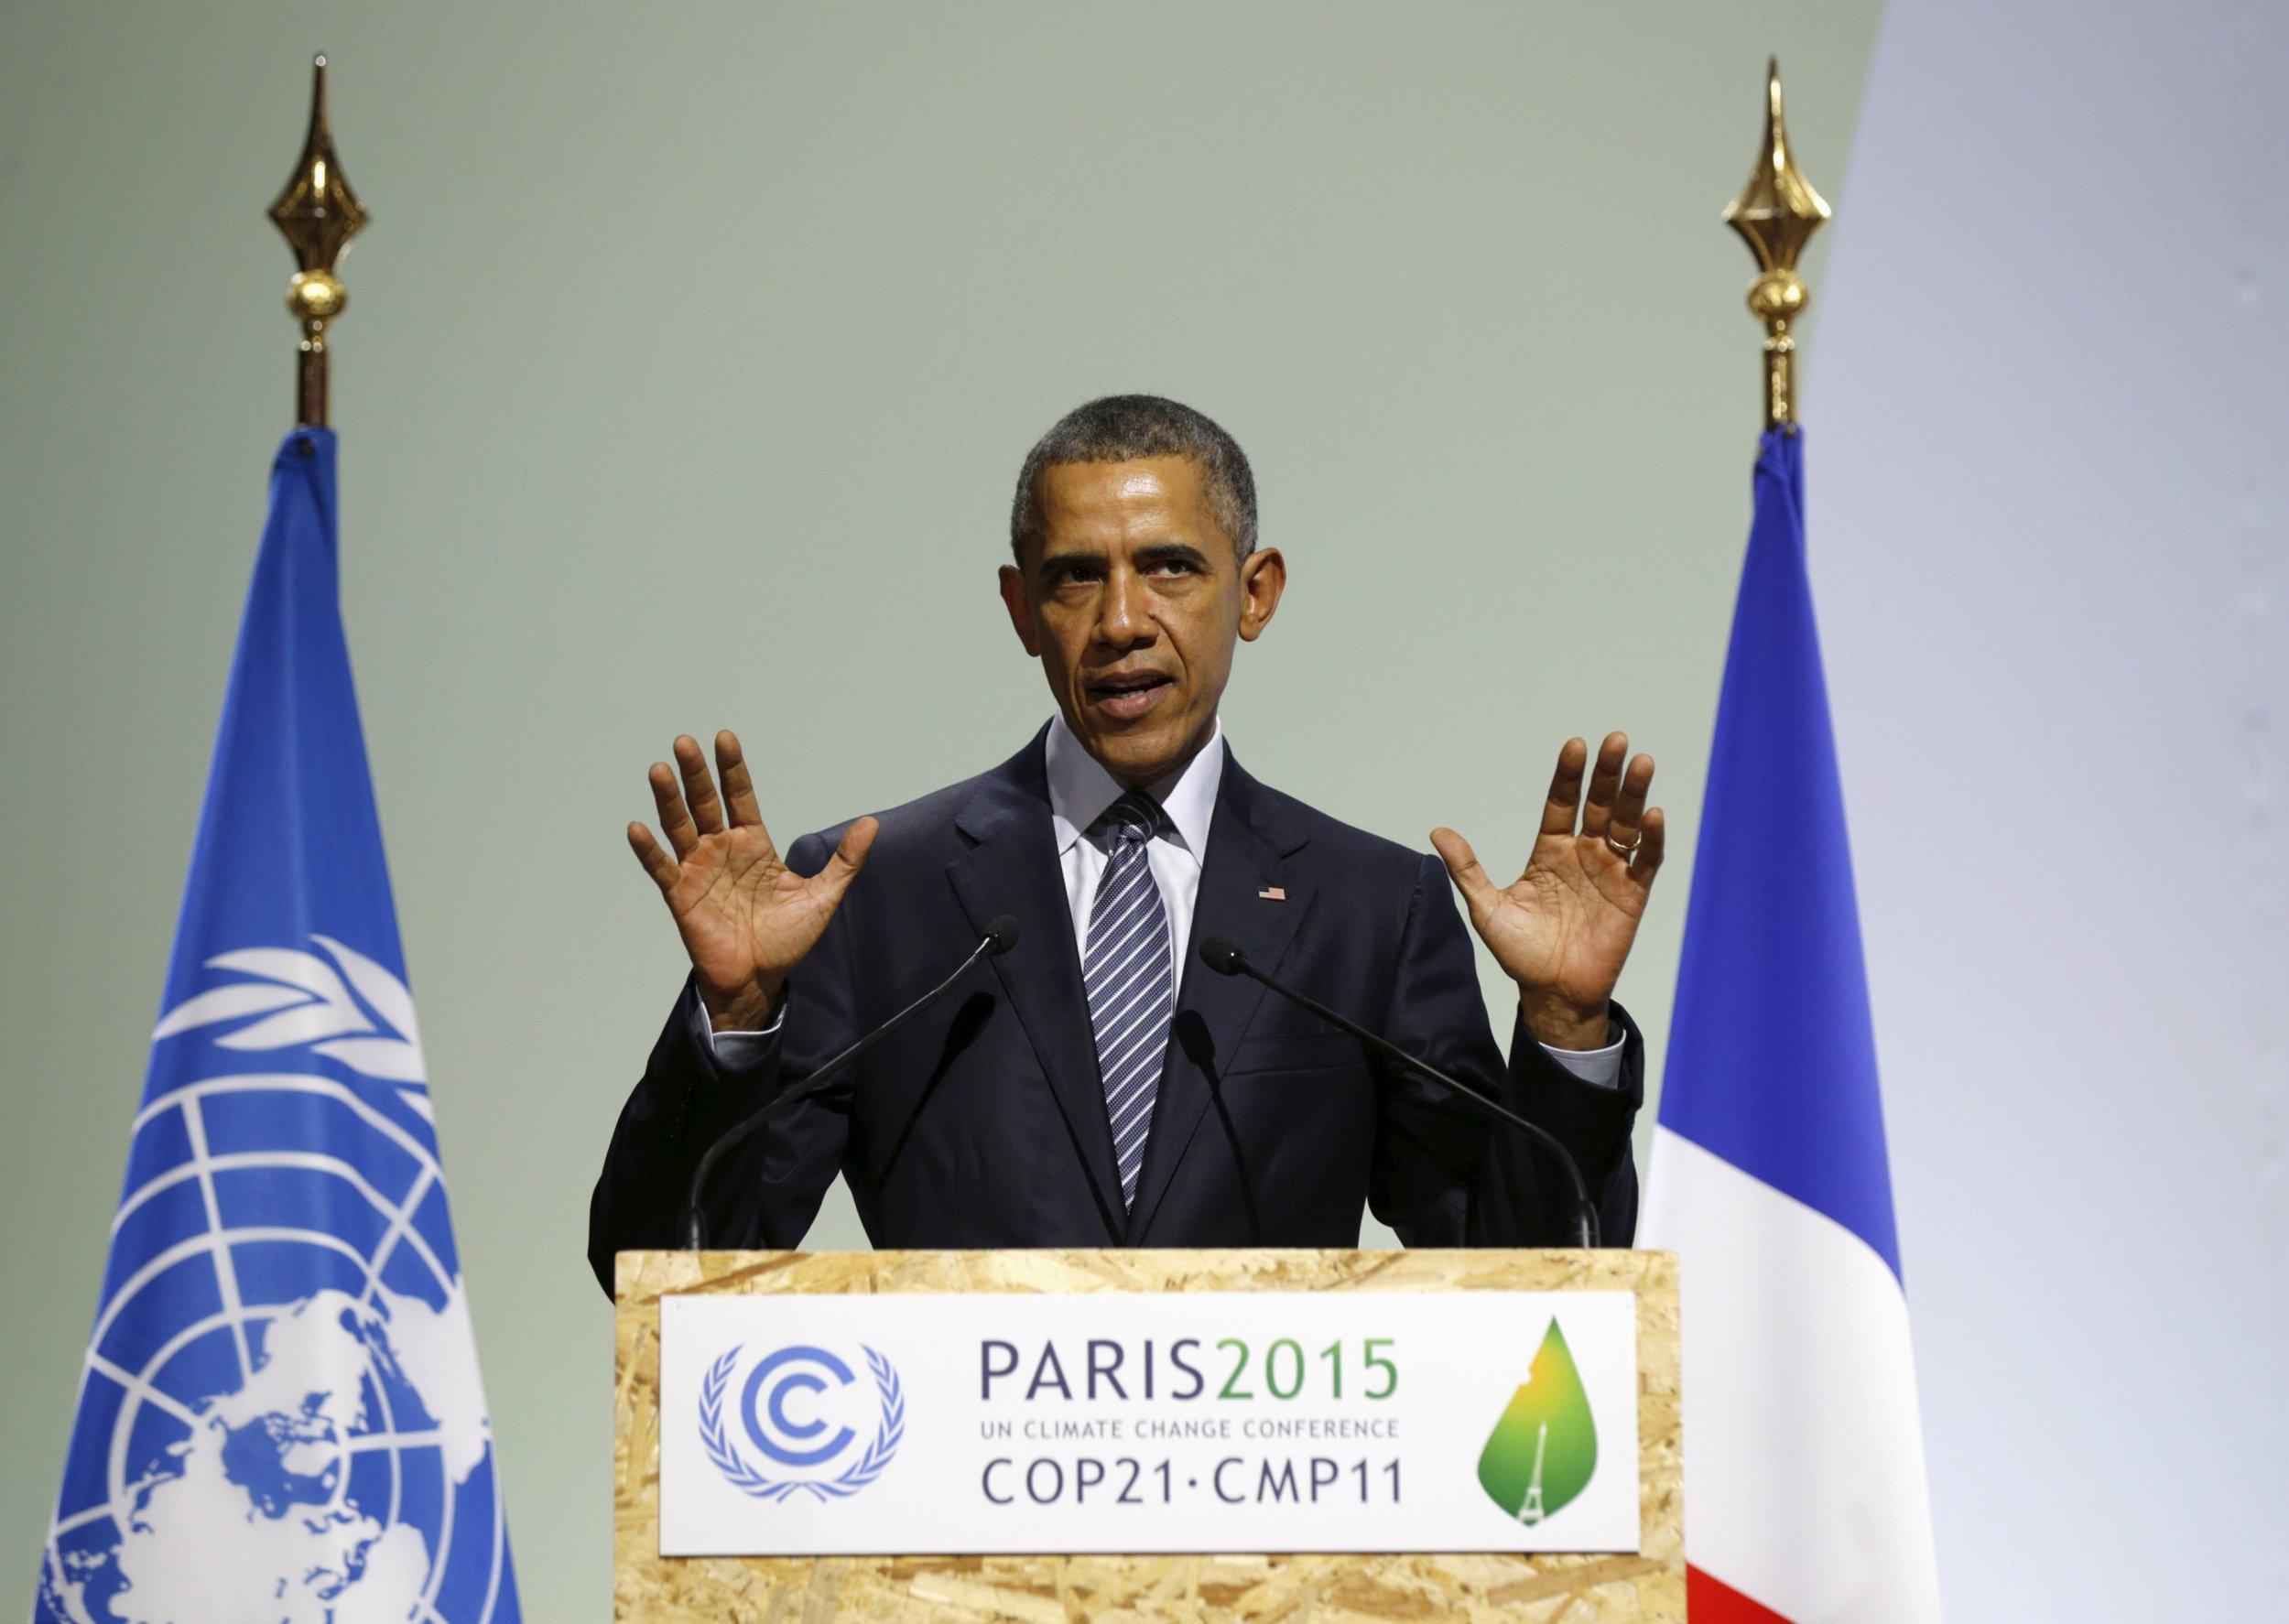 1130_Obama_climate_talks_01